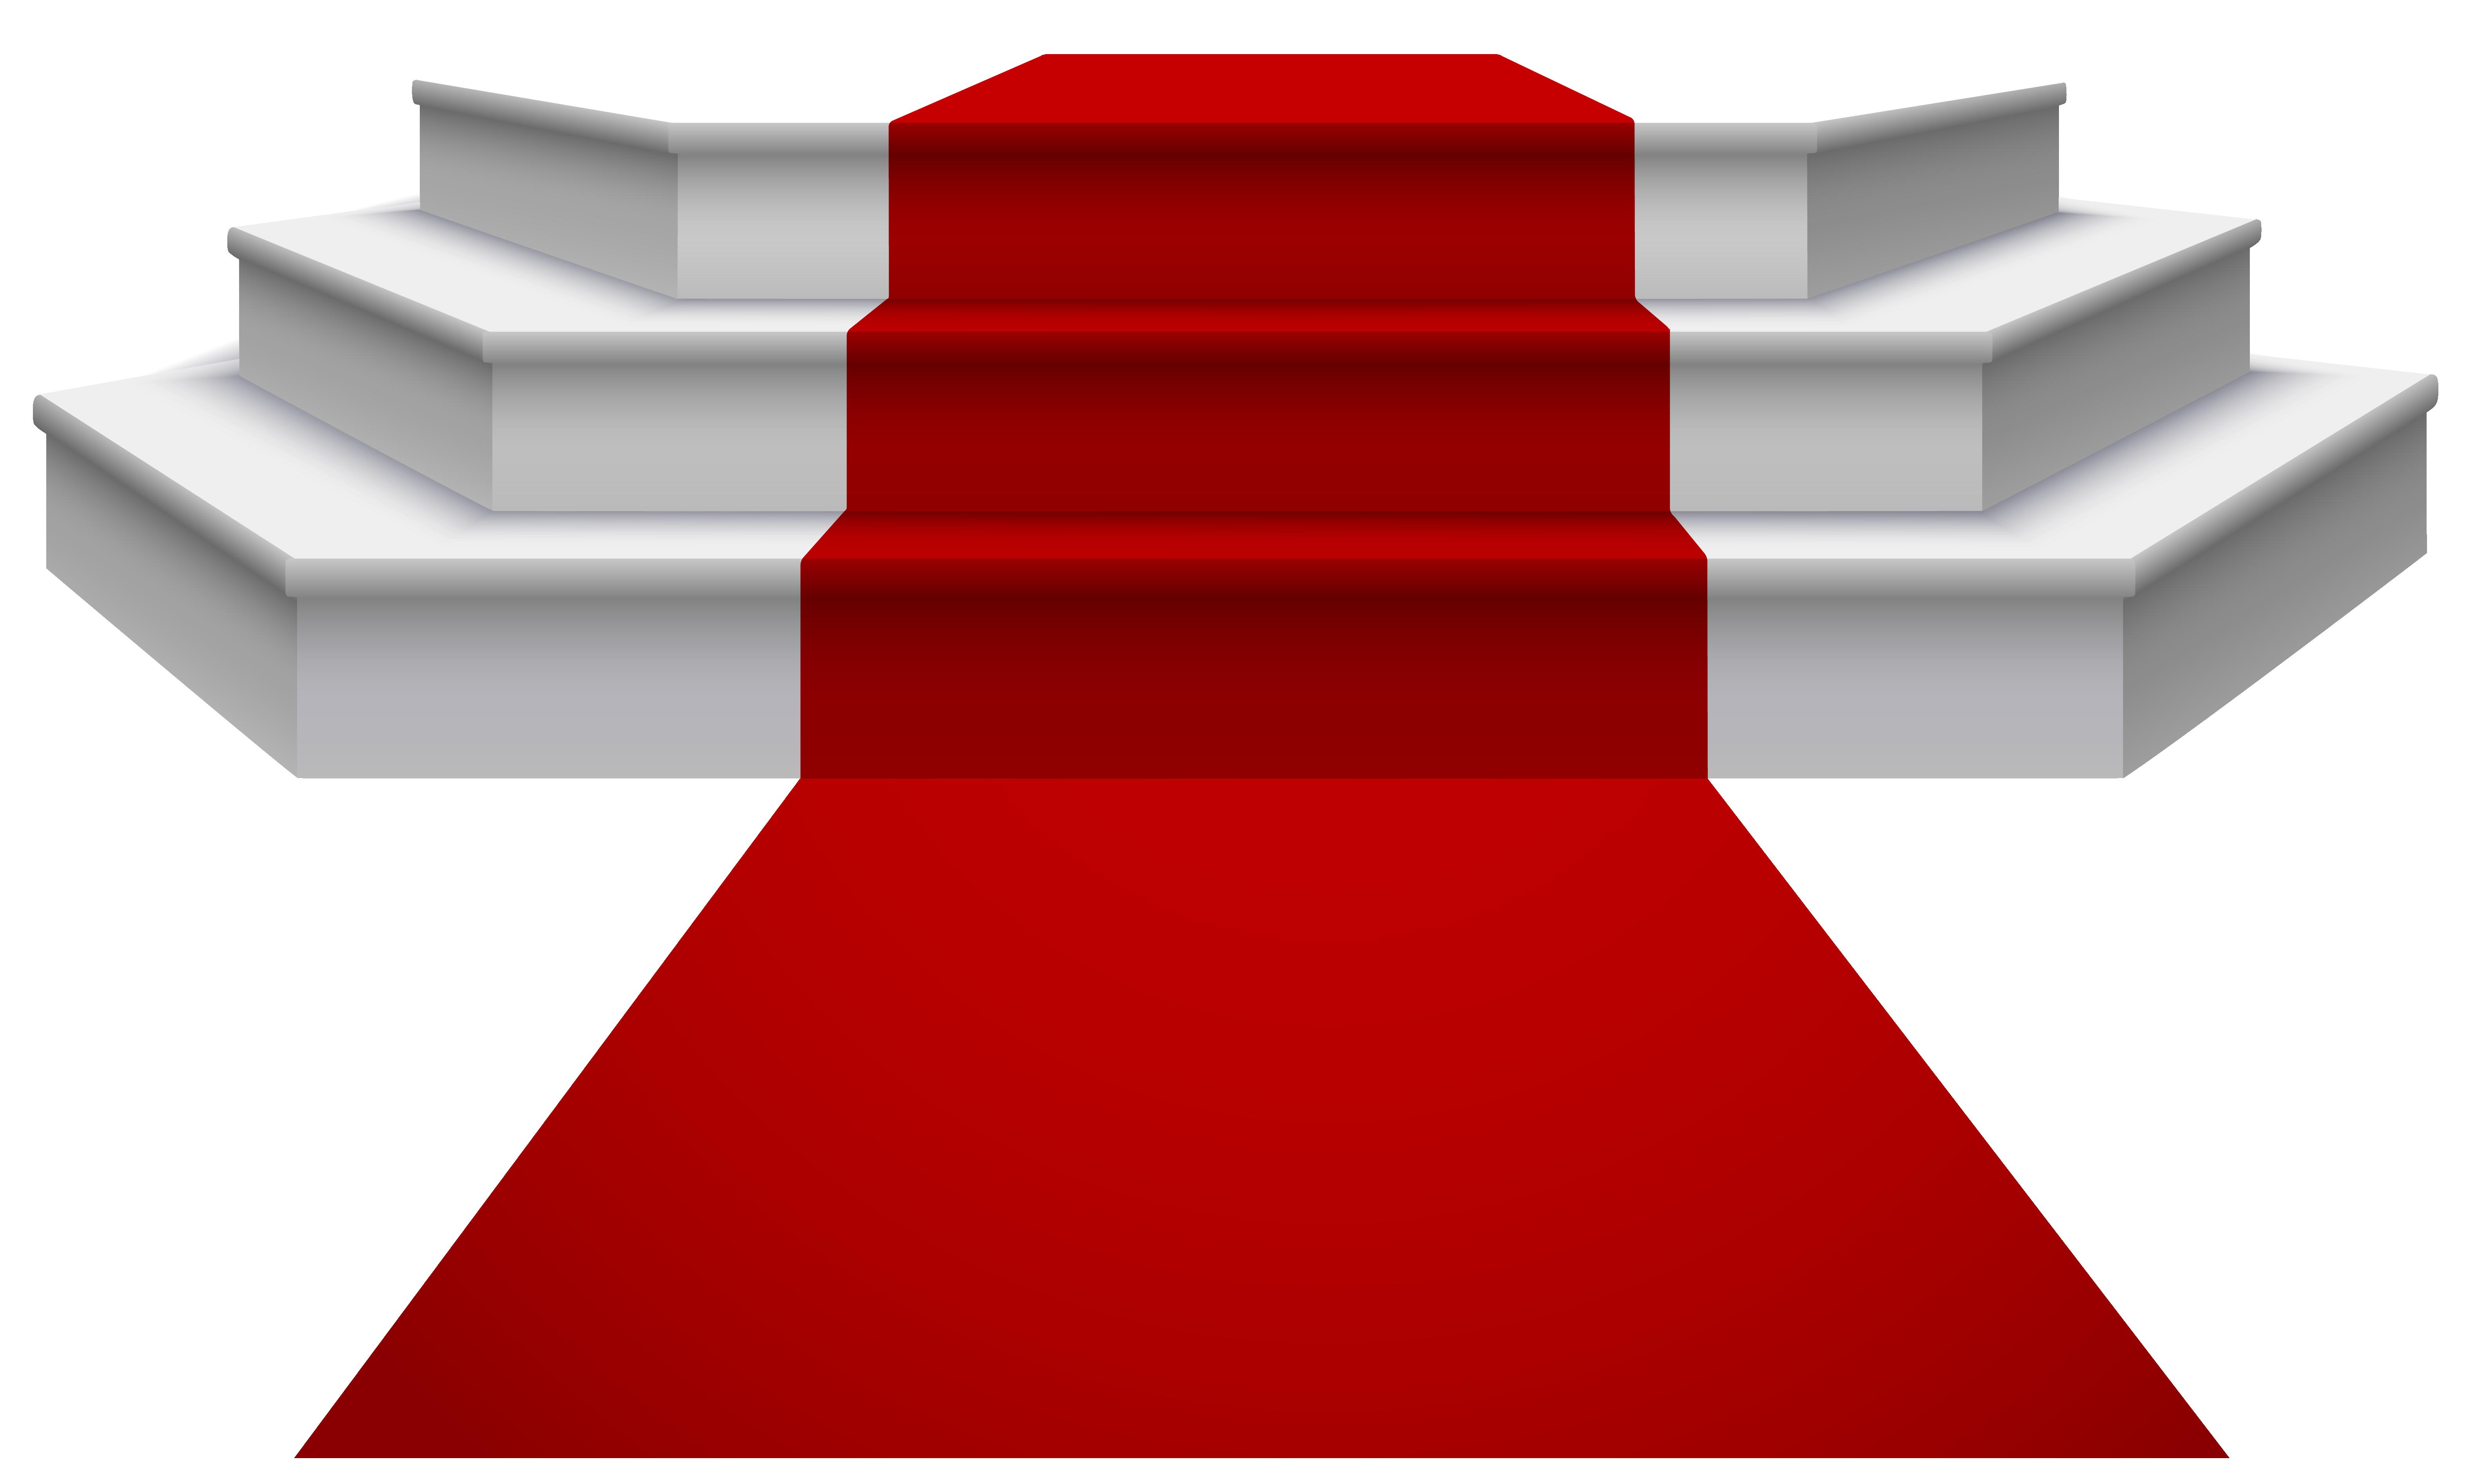 Carpet clipart transparent. Red transparentpng